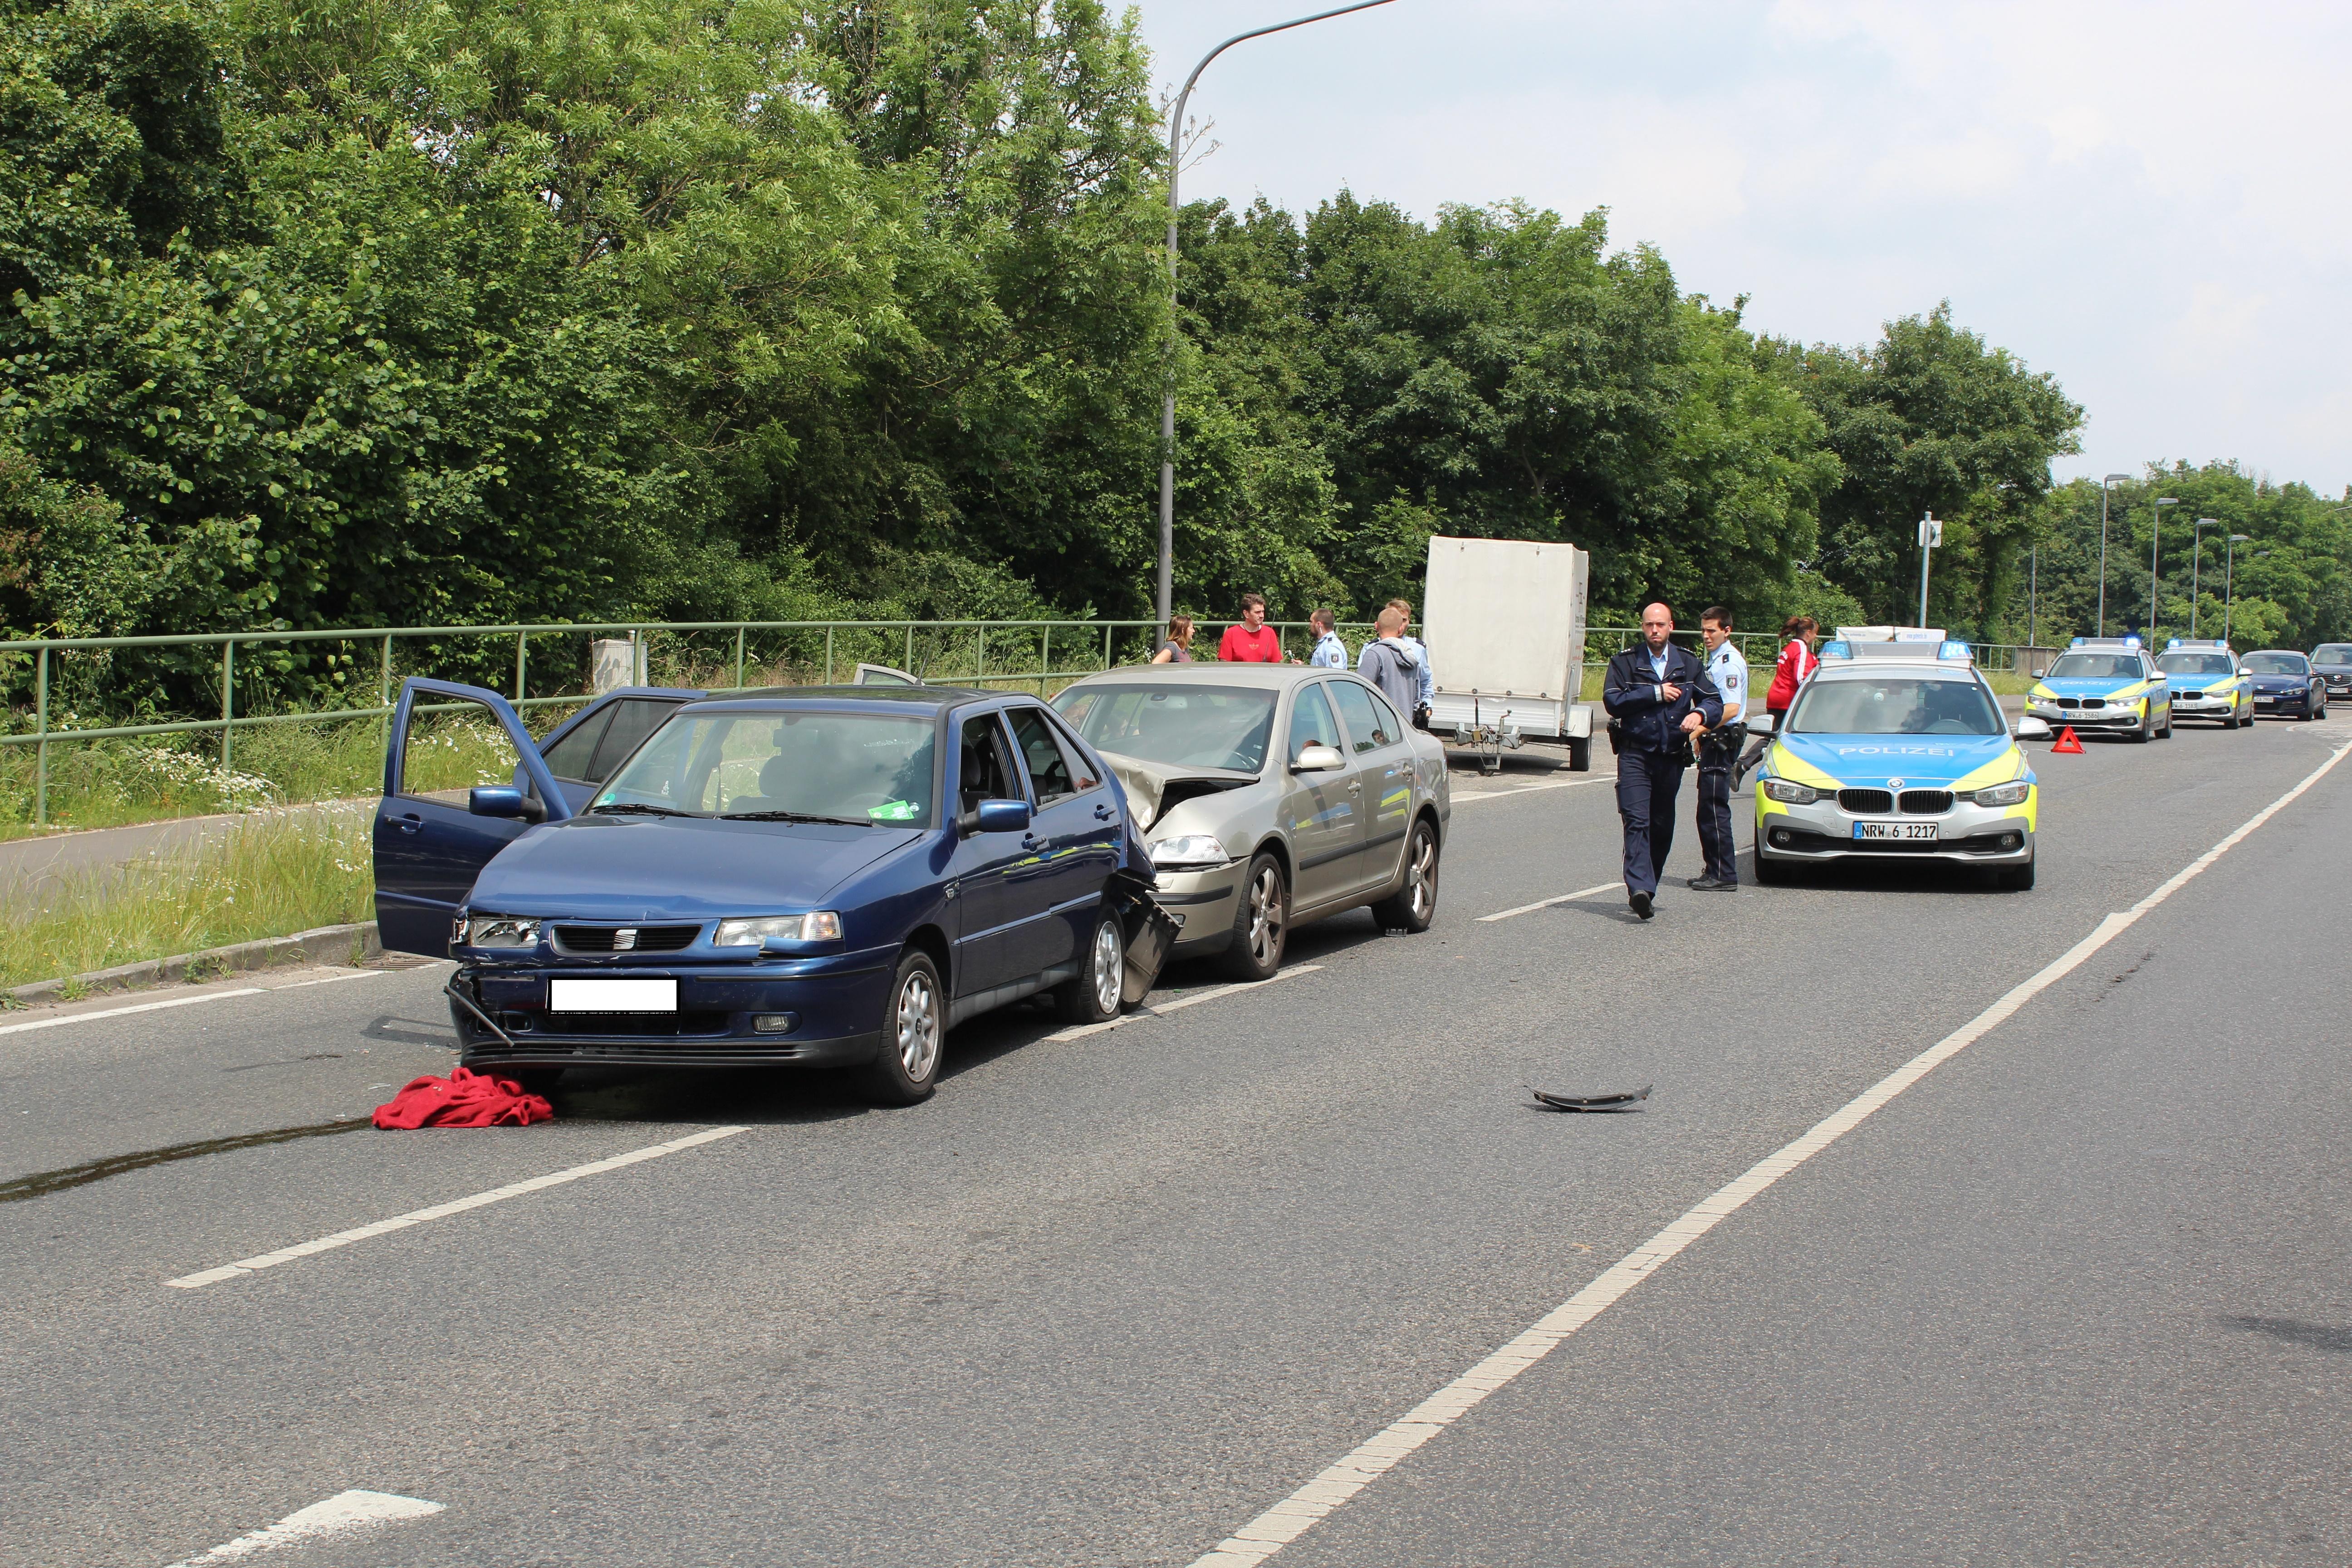 Autofahrer unter Alkoholeinfluss verursacht Unfall (Foto: OTS)